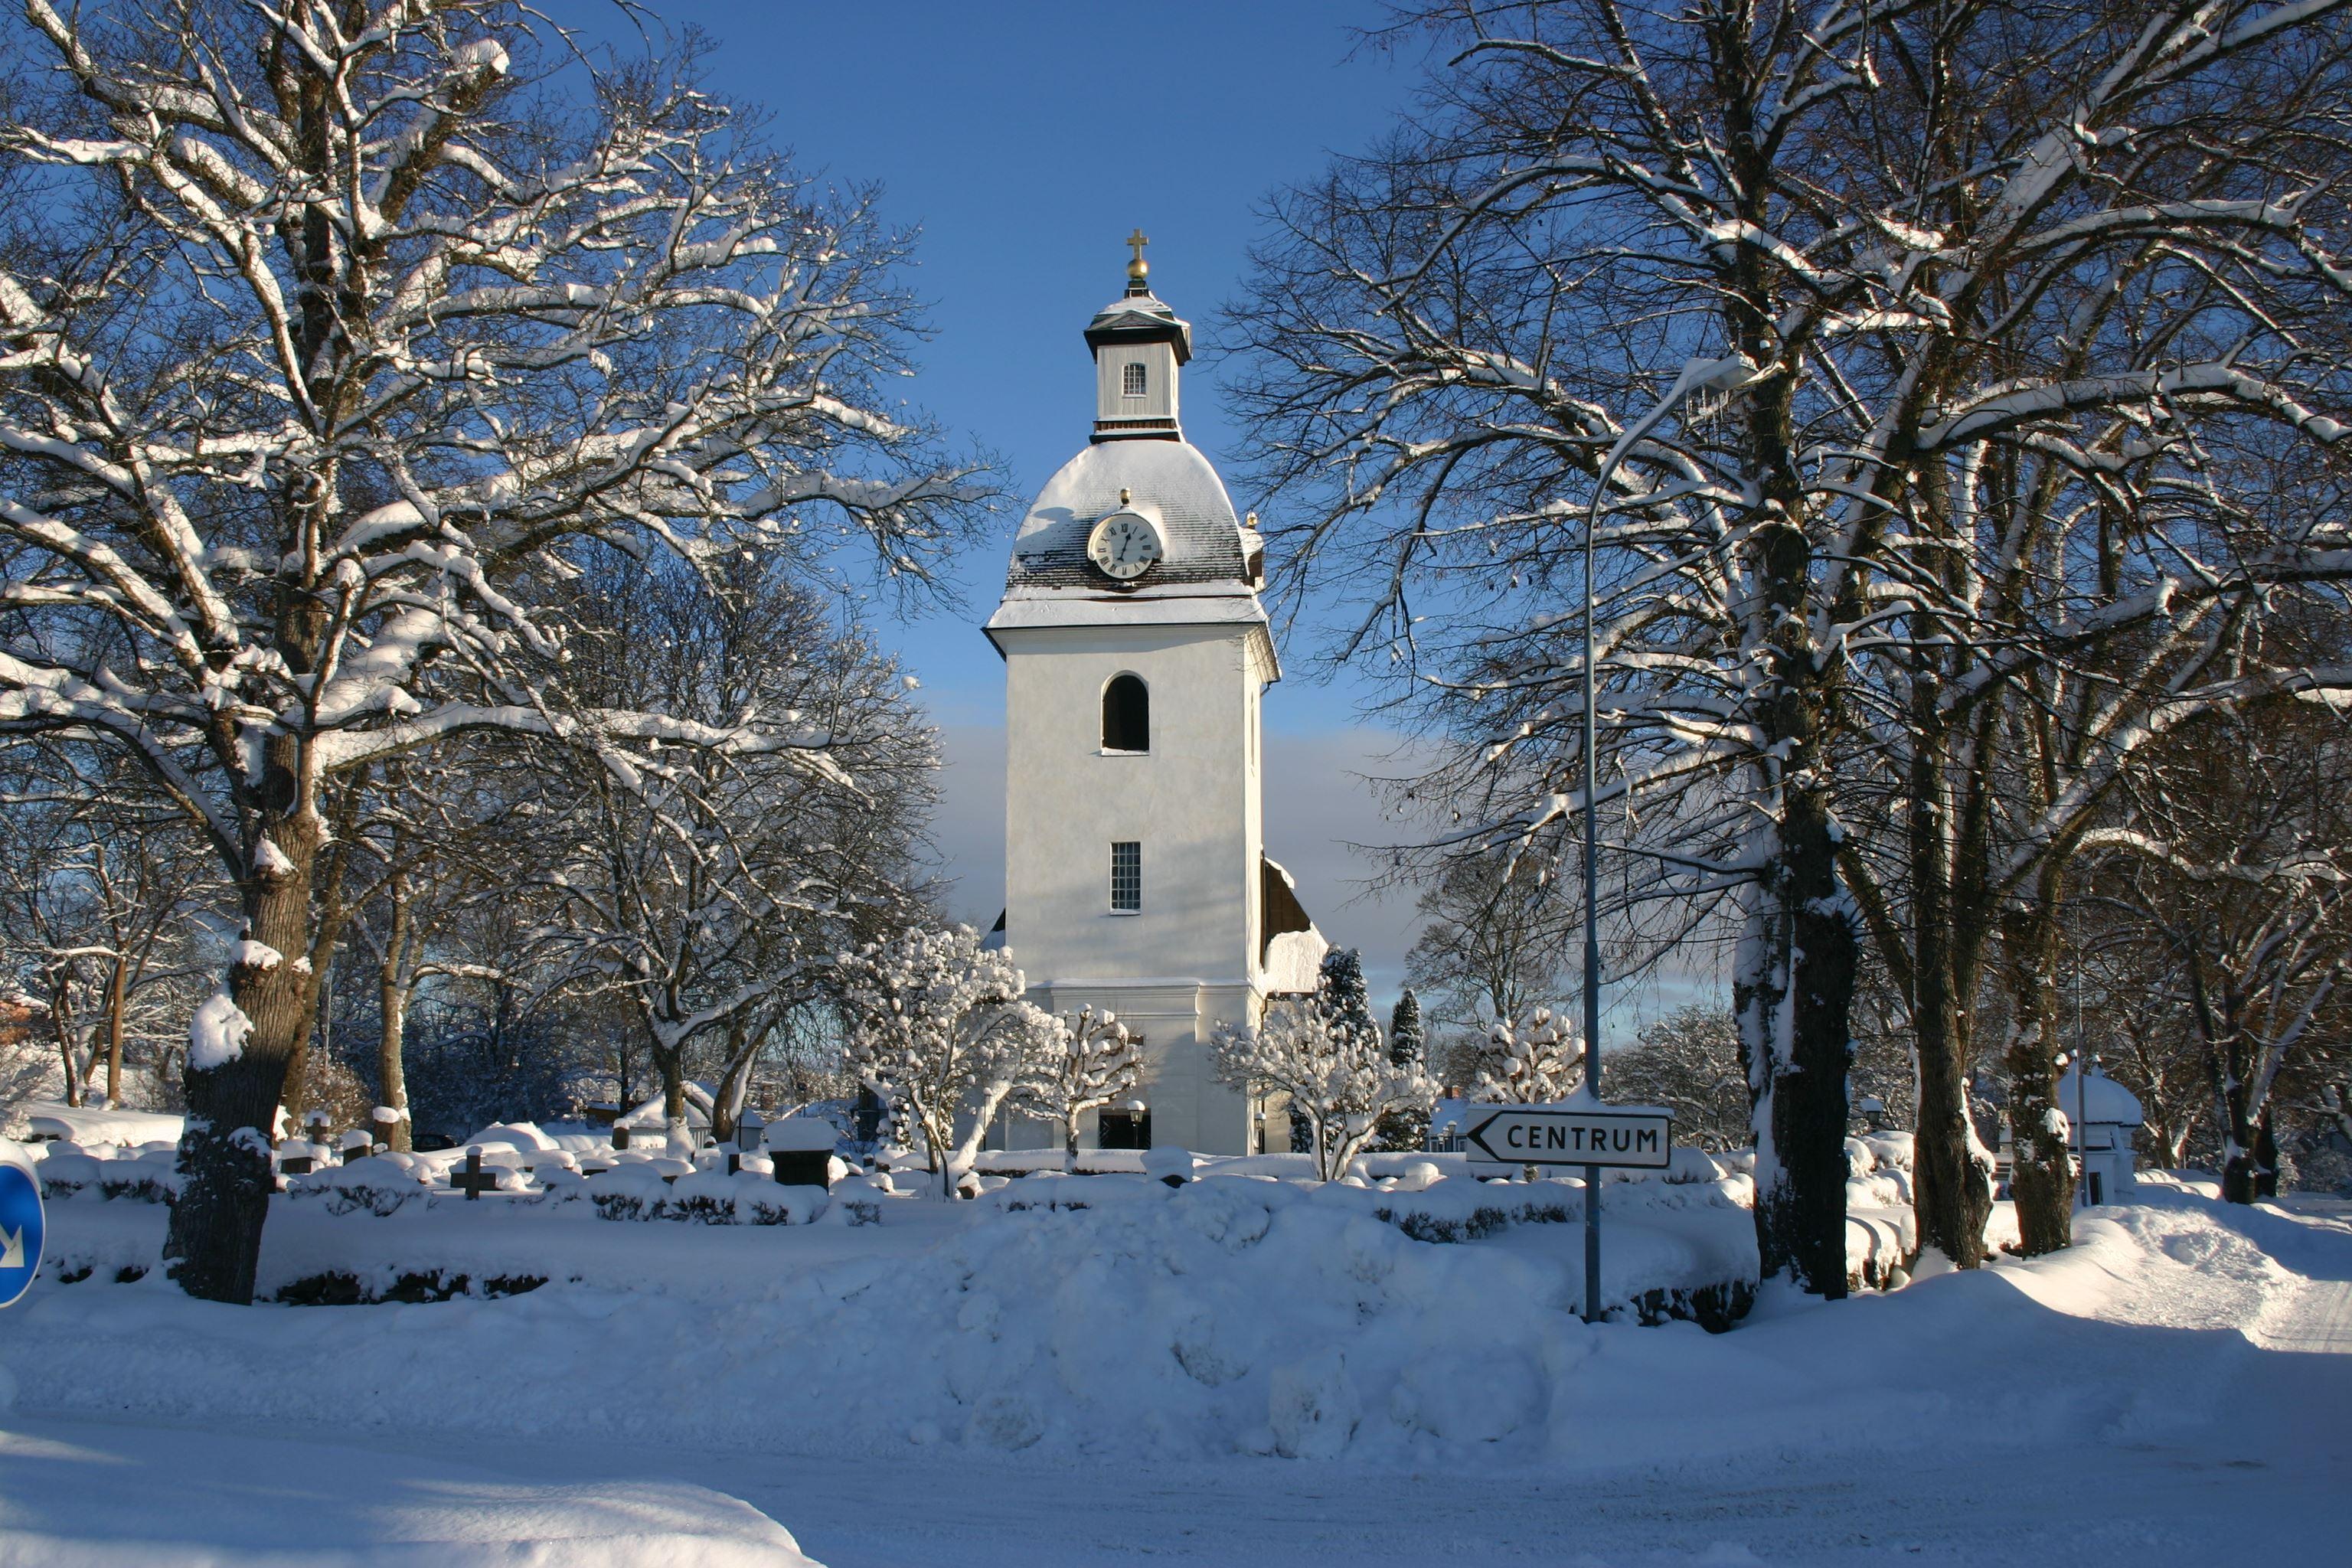 Nils Thorén, Kristdala kyrka i vinterskrud